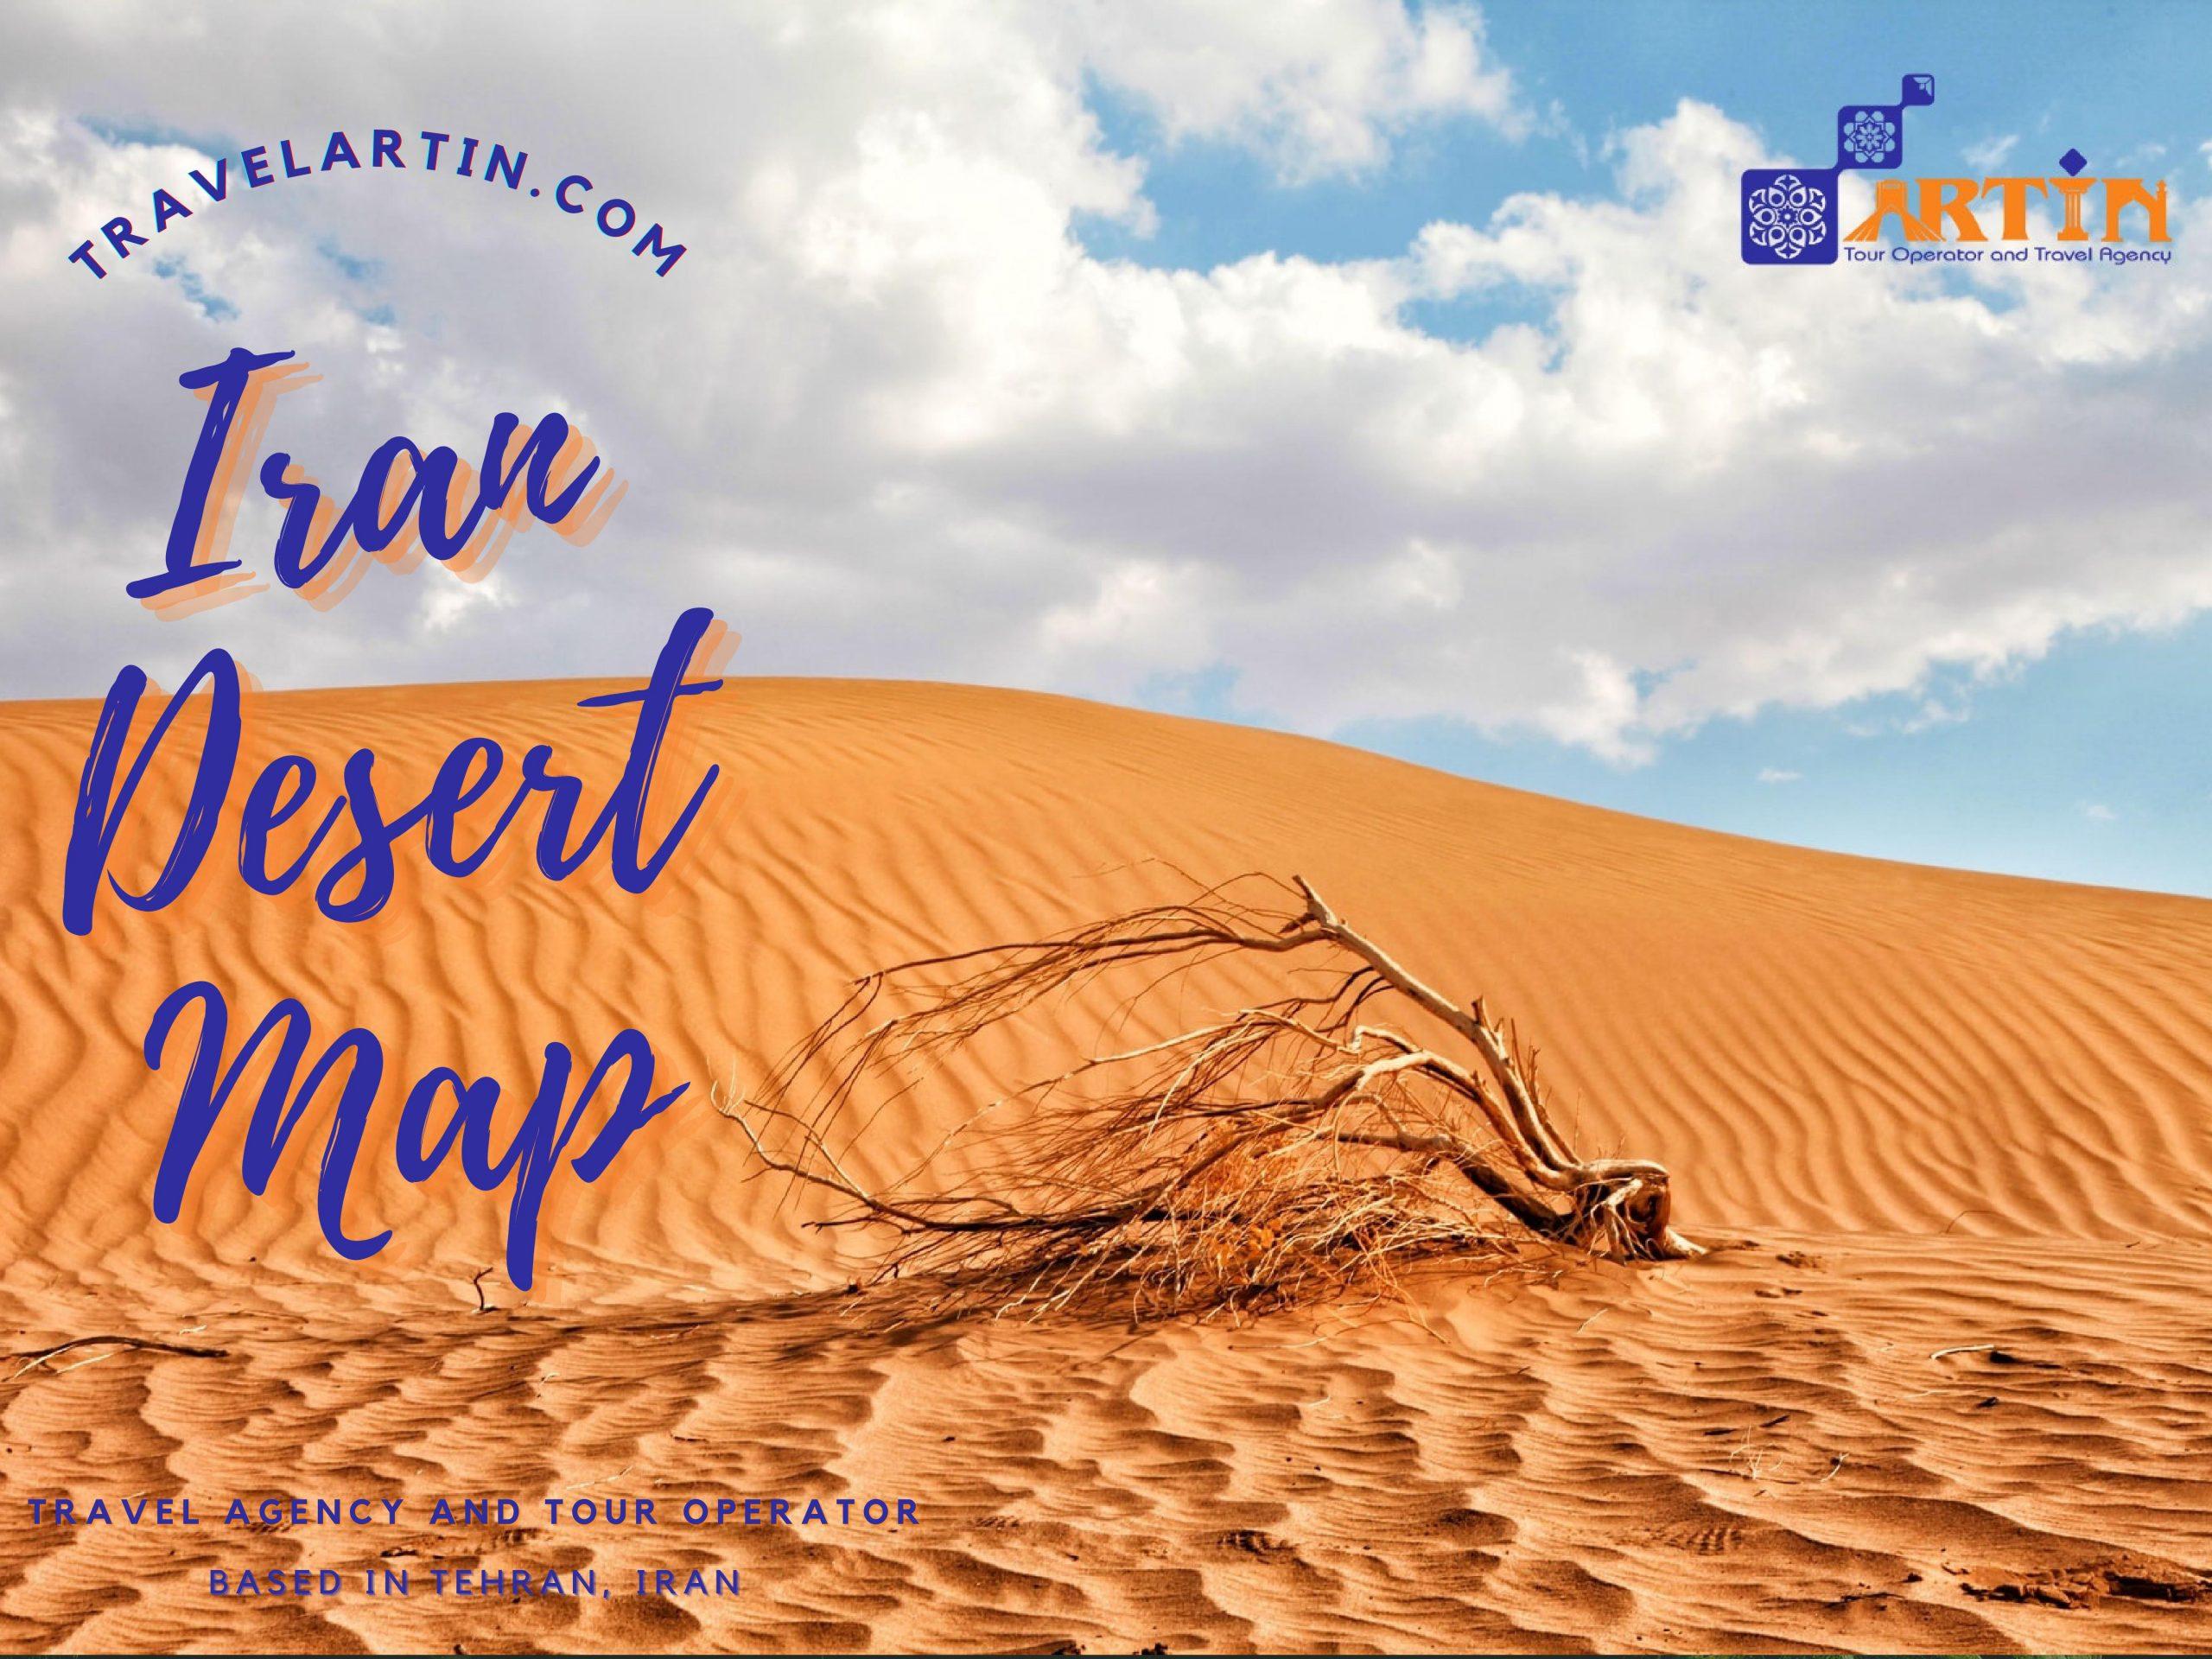 Iran desert map travelartin.com